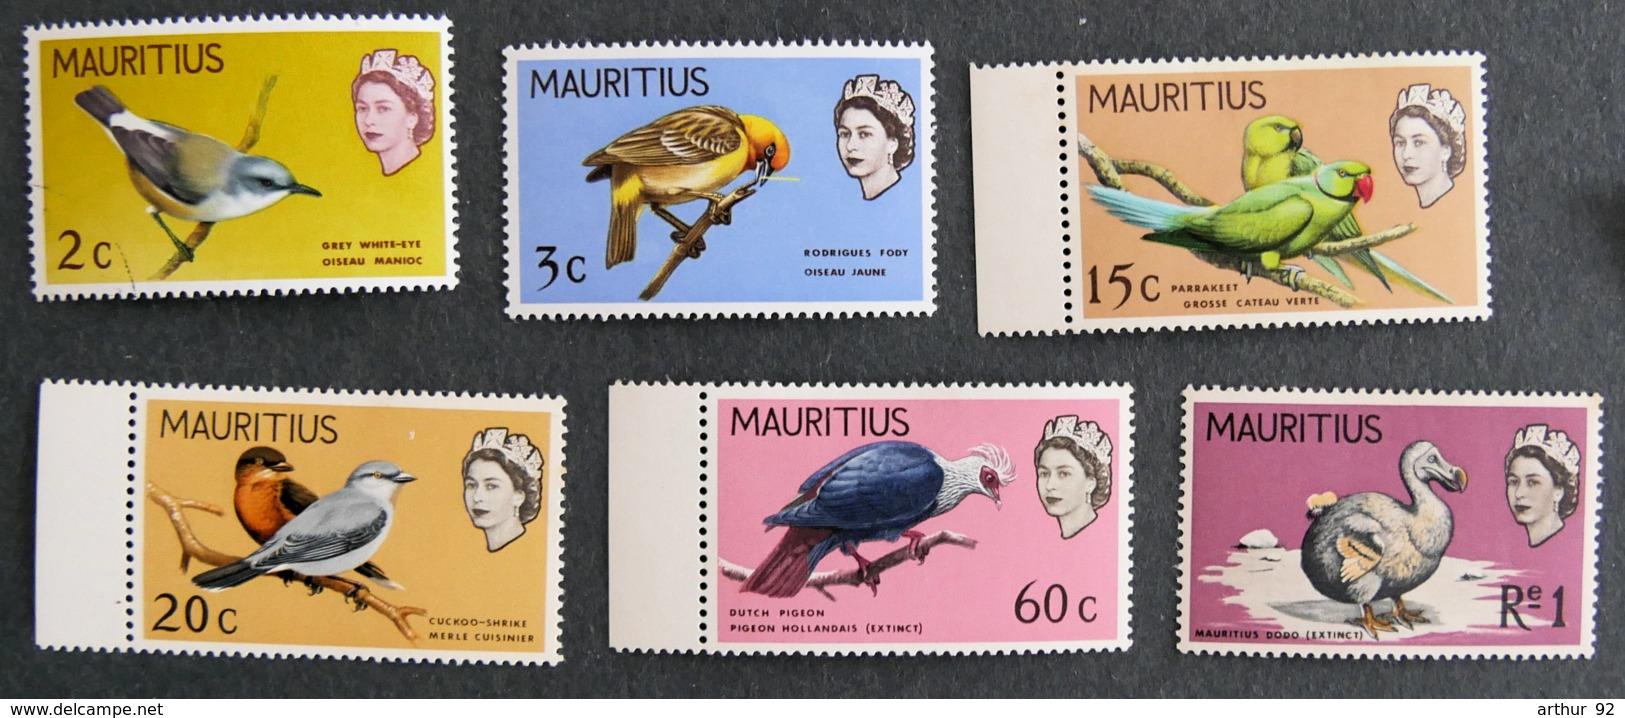 ILE MAURICE - MAURITIUS - 1968 - YT 317 à 322** - SERIE COURANTE OISEAUX - Mauritius (1968-...)